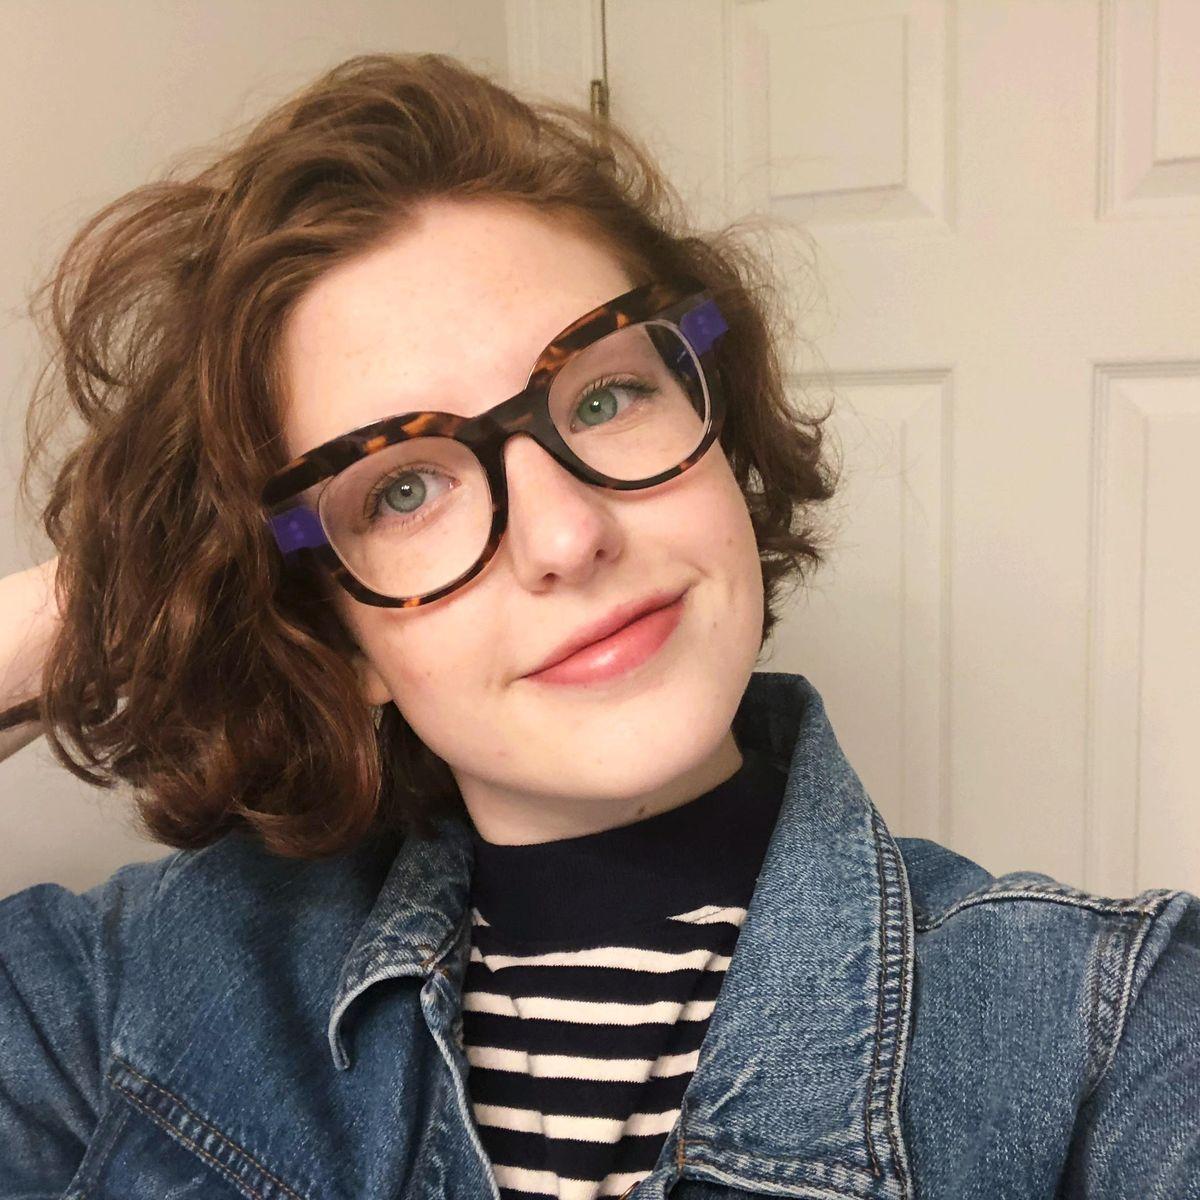 Bobbi Brown Lipstick Review 2020 The